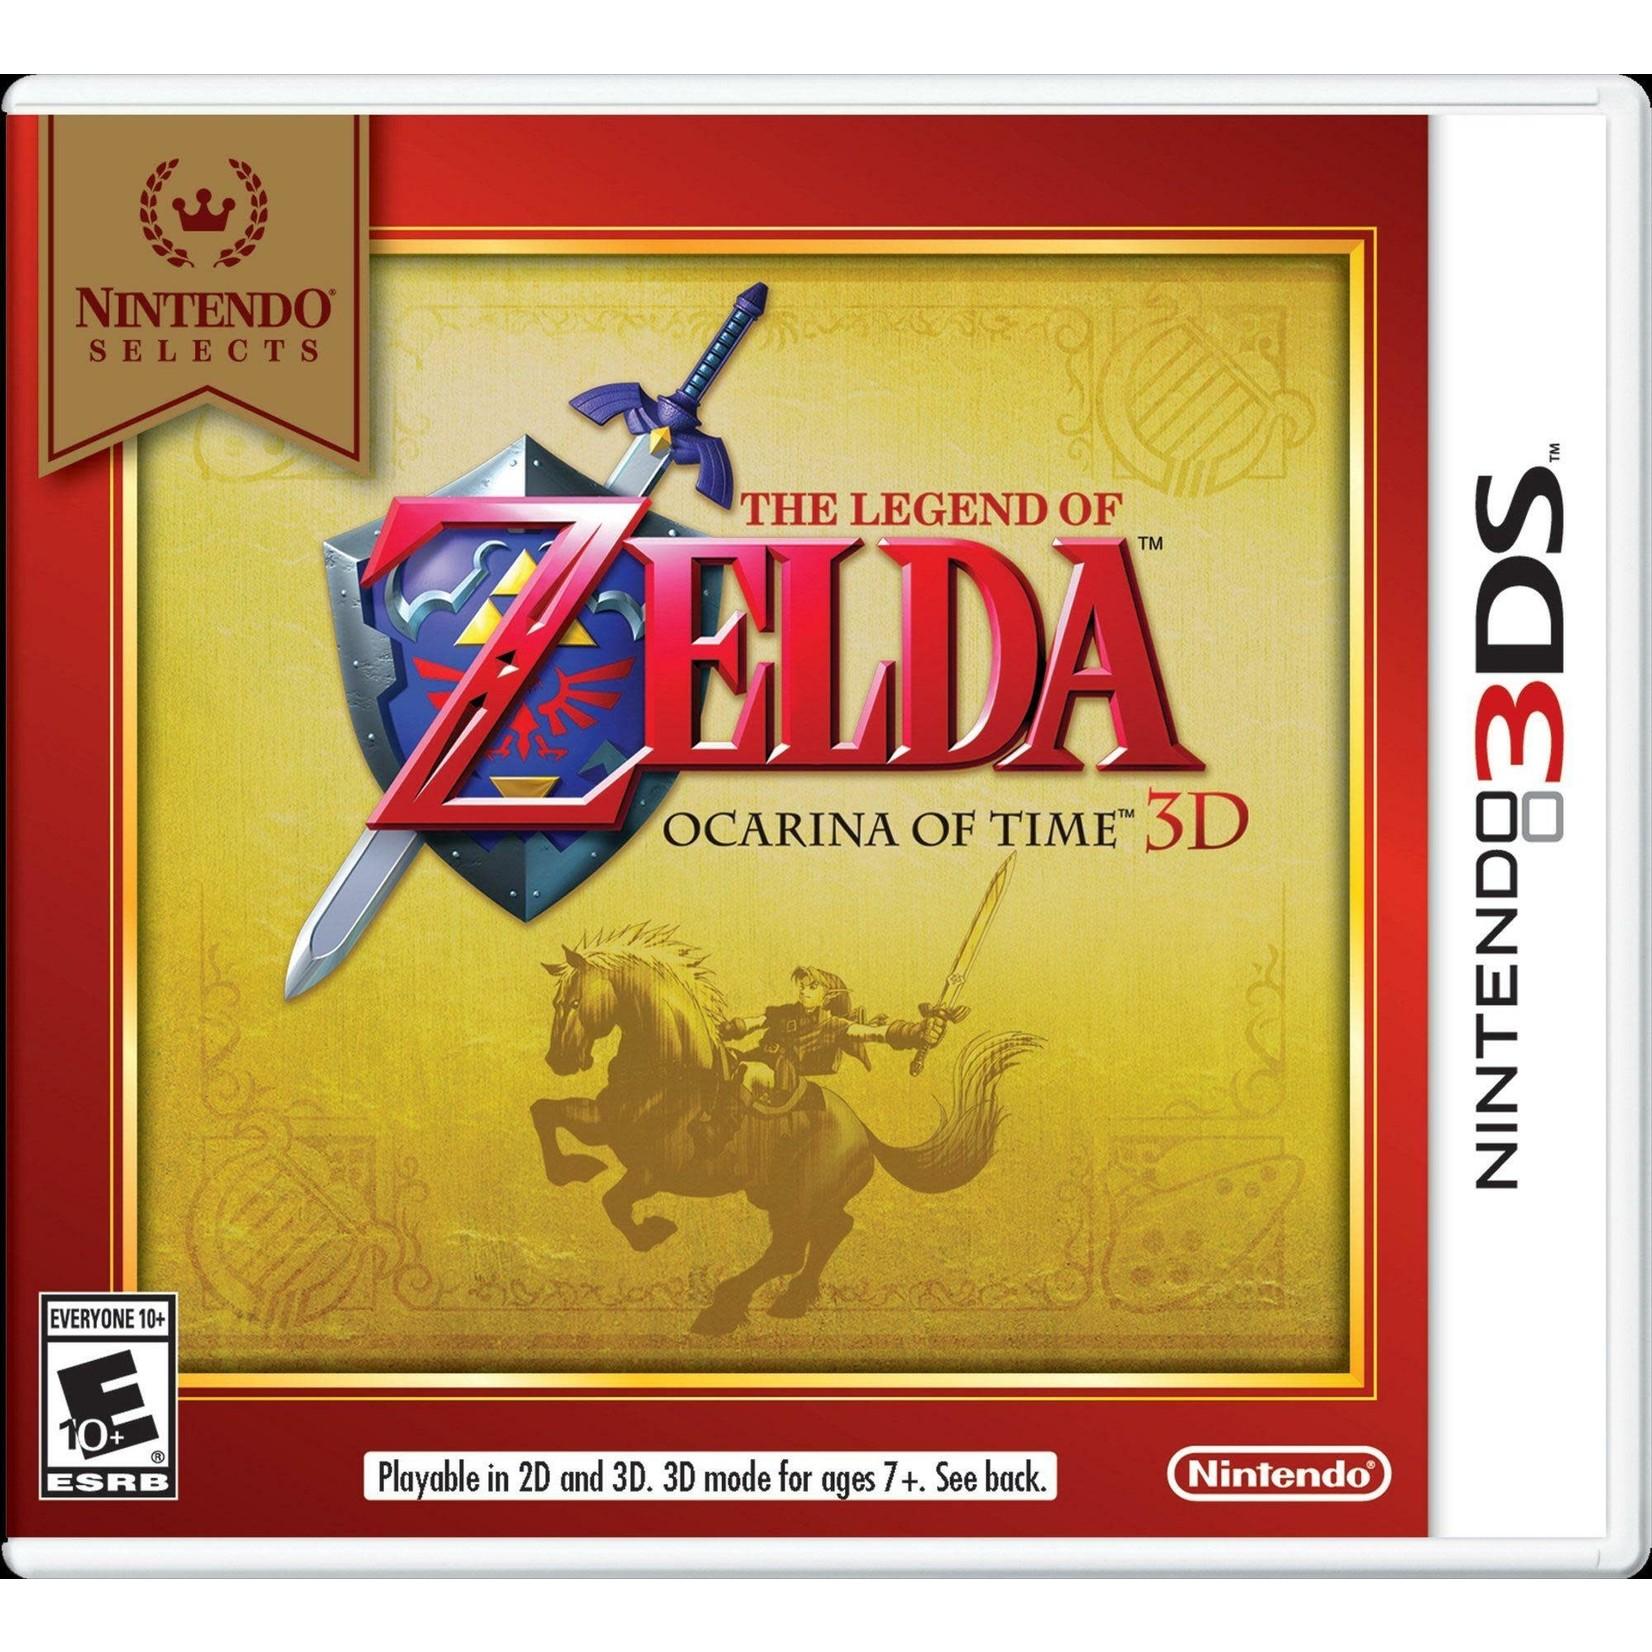 3DSU-The Legend of Zelda: Ocarina of Time - 3DS